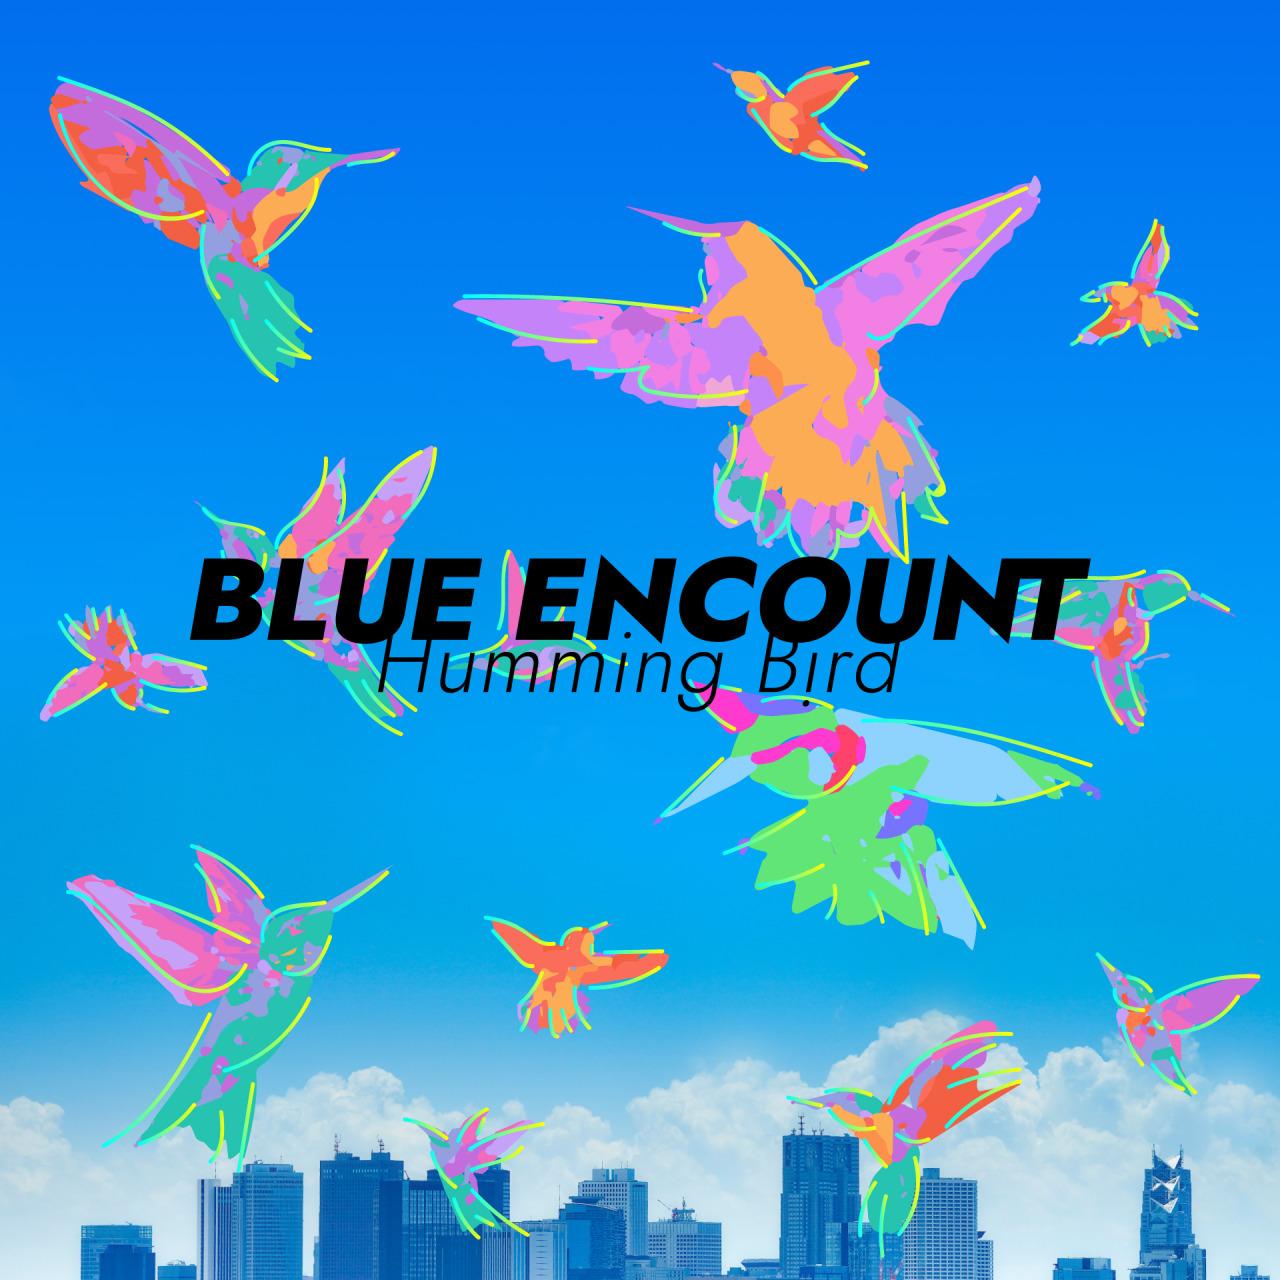 BLUE ENCOUNT 「Humming Bird」CD Jacket / Artist Photo